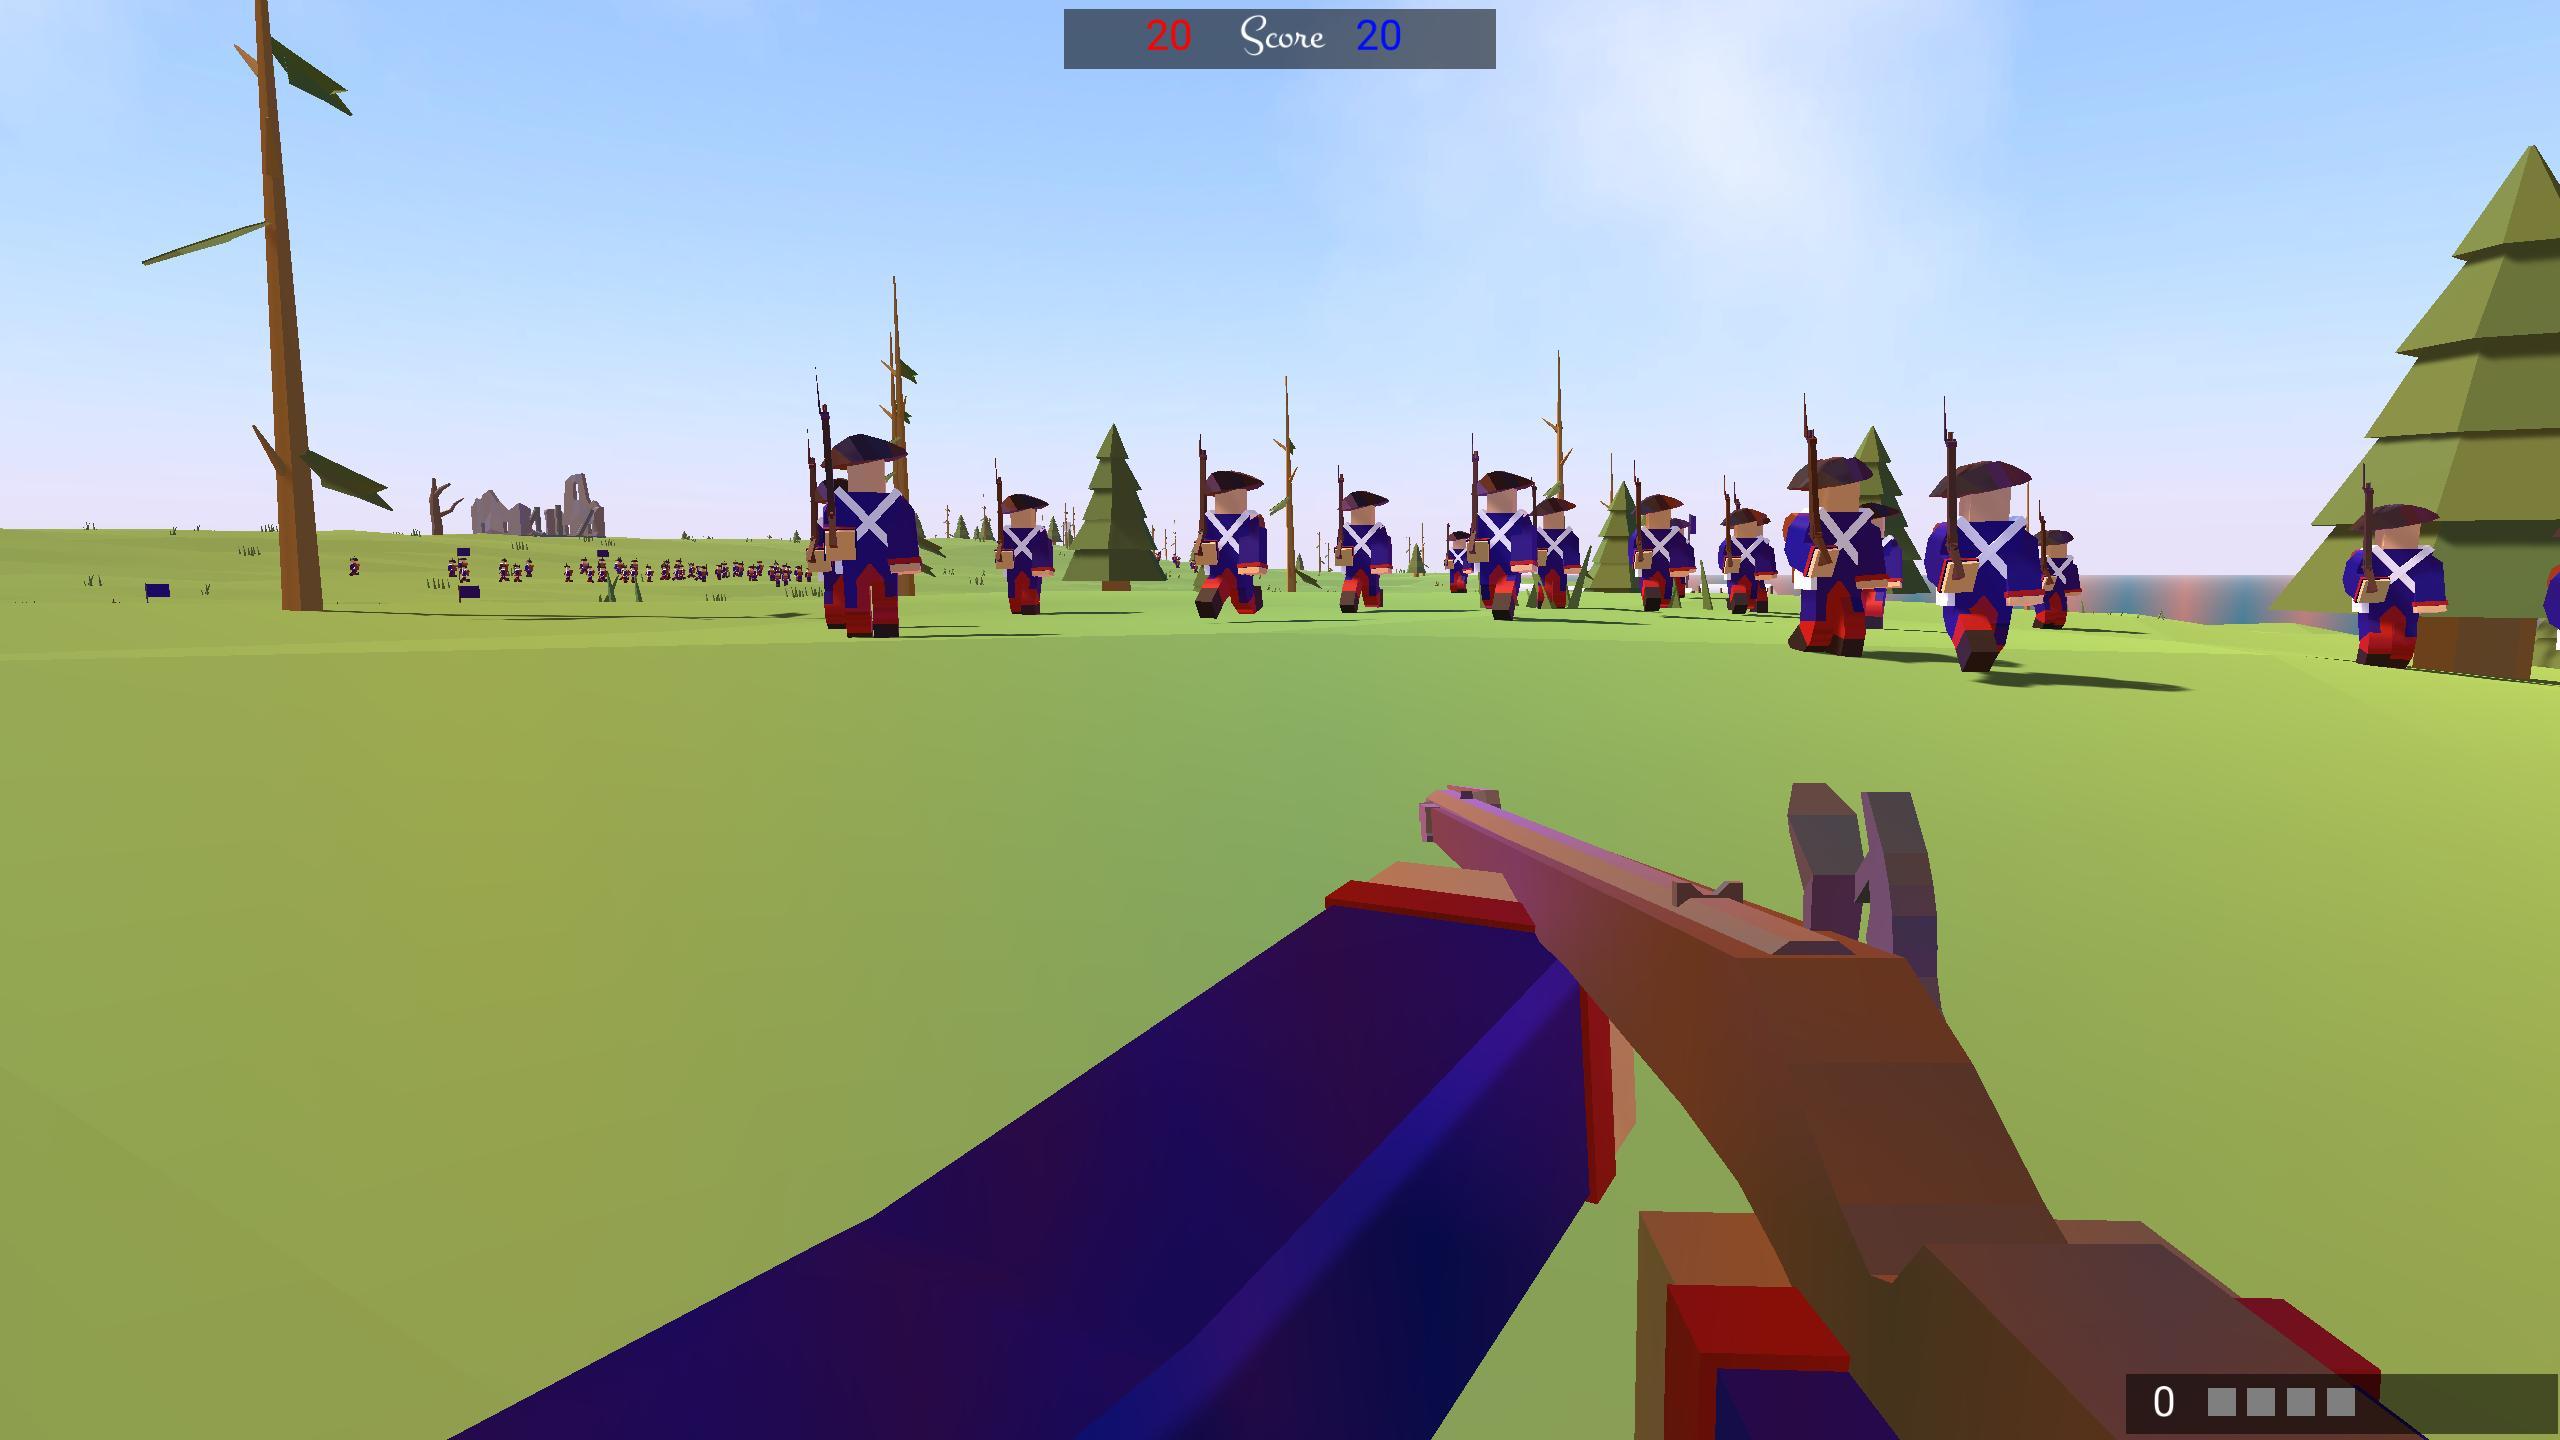 Скриншоты к Rise of Liberty [v26.01.18] [Steam Early Access] - игра в разработке